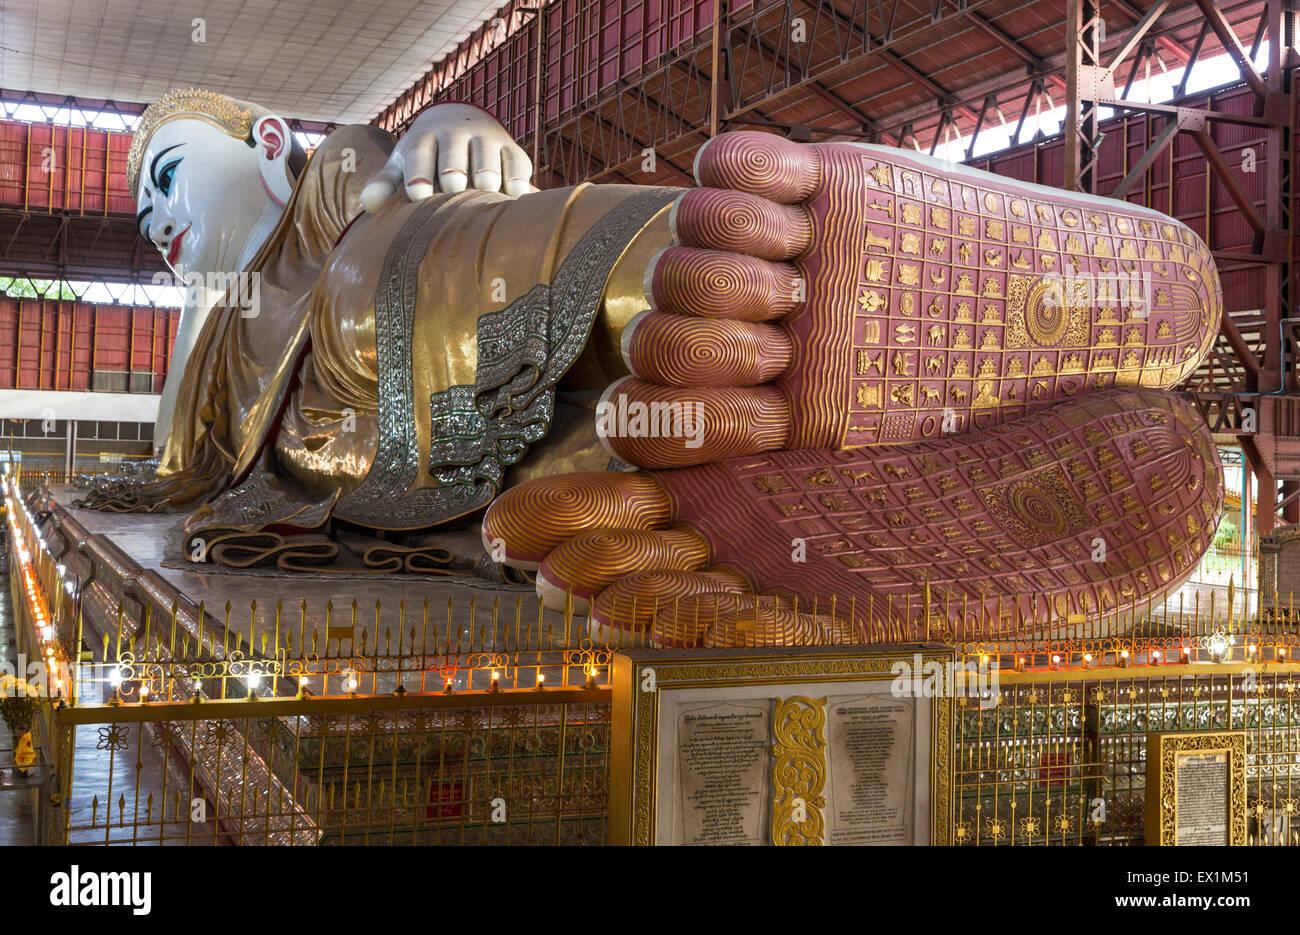 Colossal reclining buddha at Chaukhtagyi pagoda in Yangon, Myanmar - Stock Image